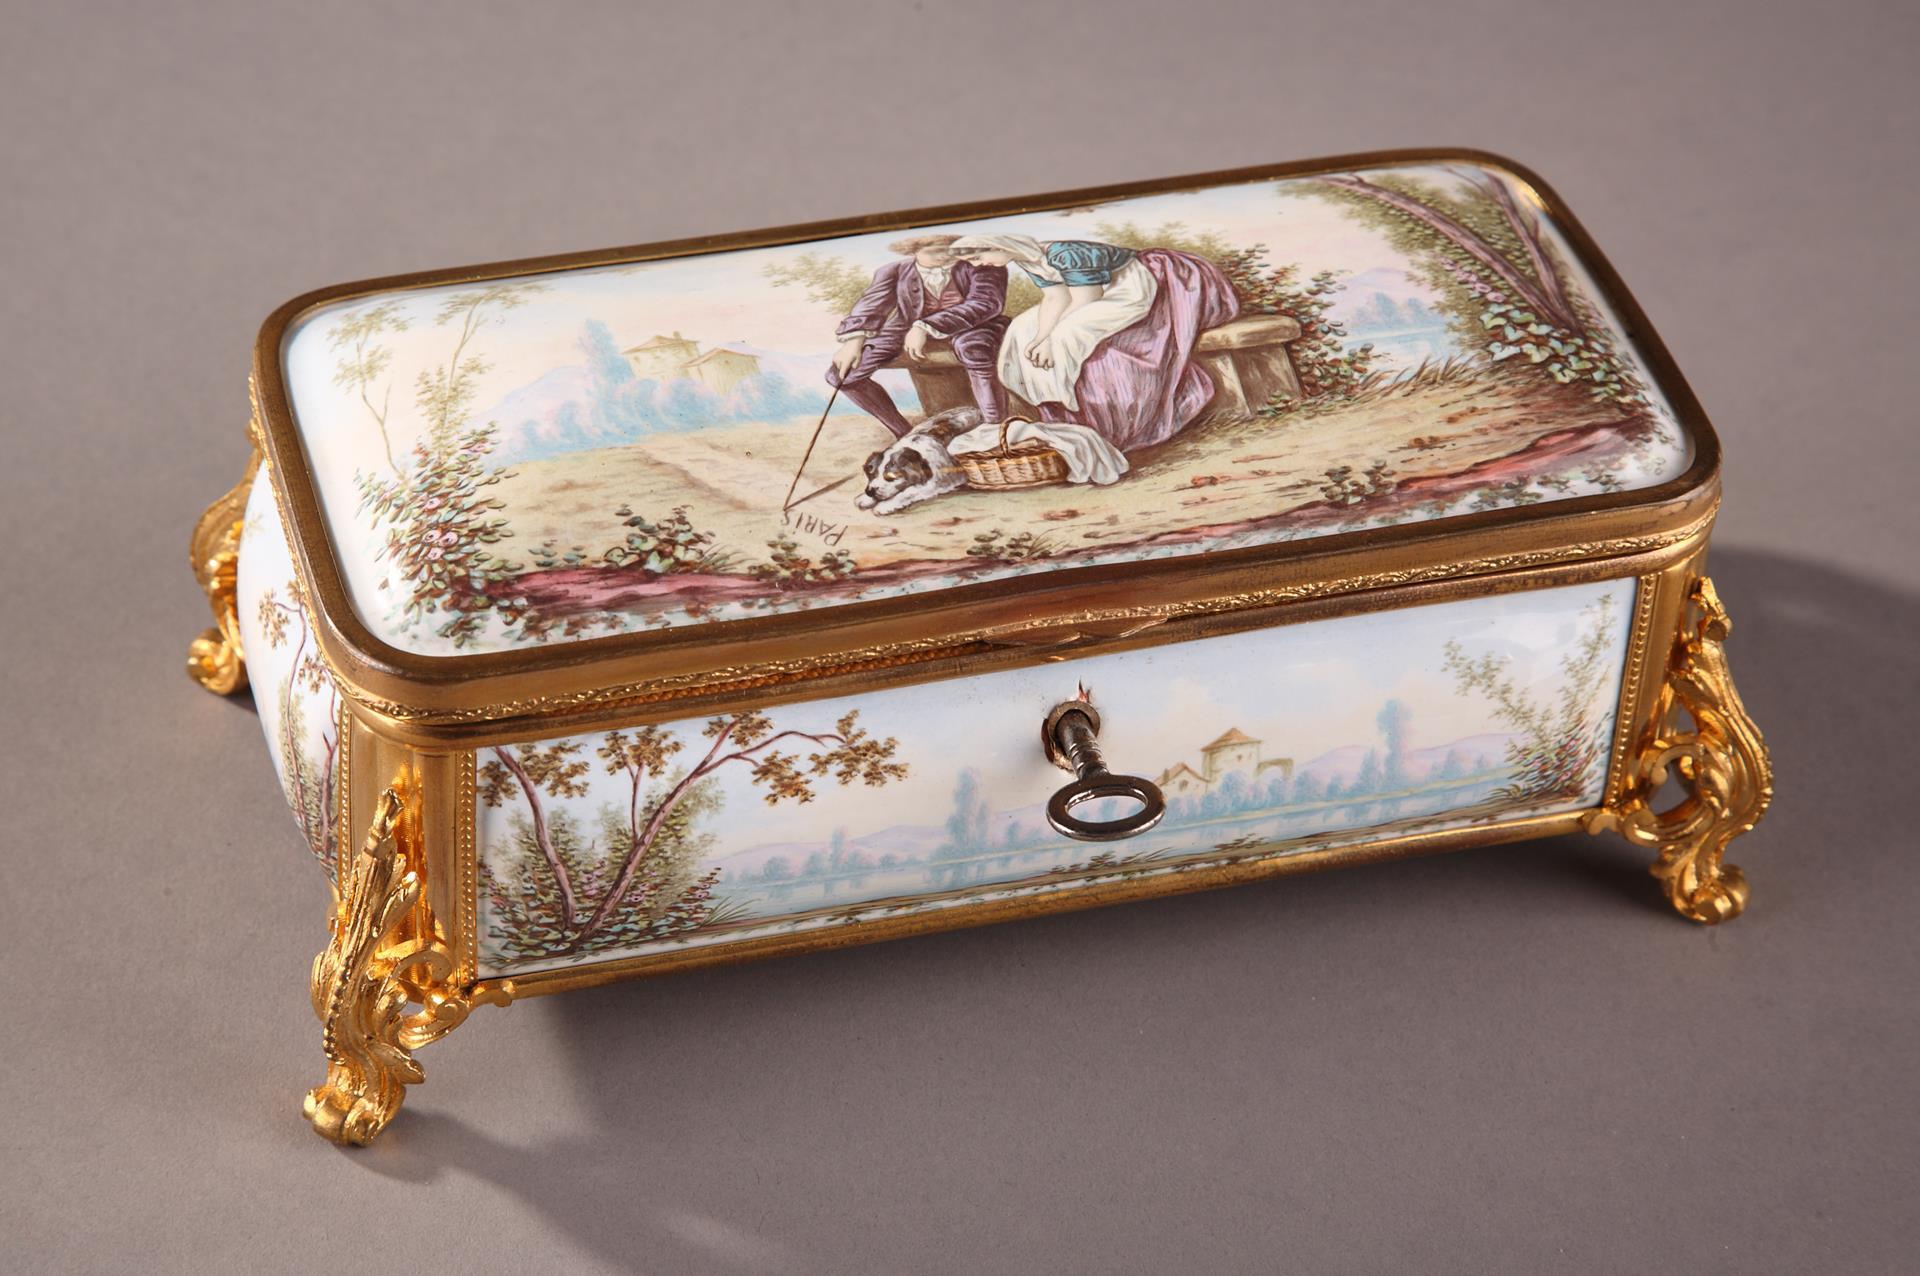 19TH CENTURY FRENCH LIMOGES ENAMEL BOX.